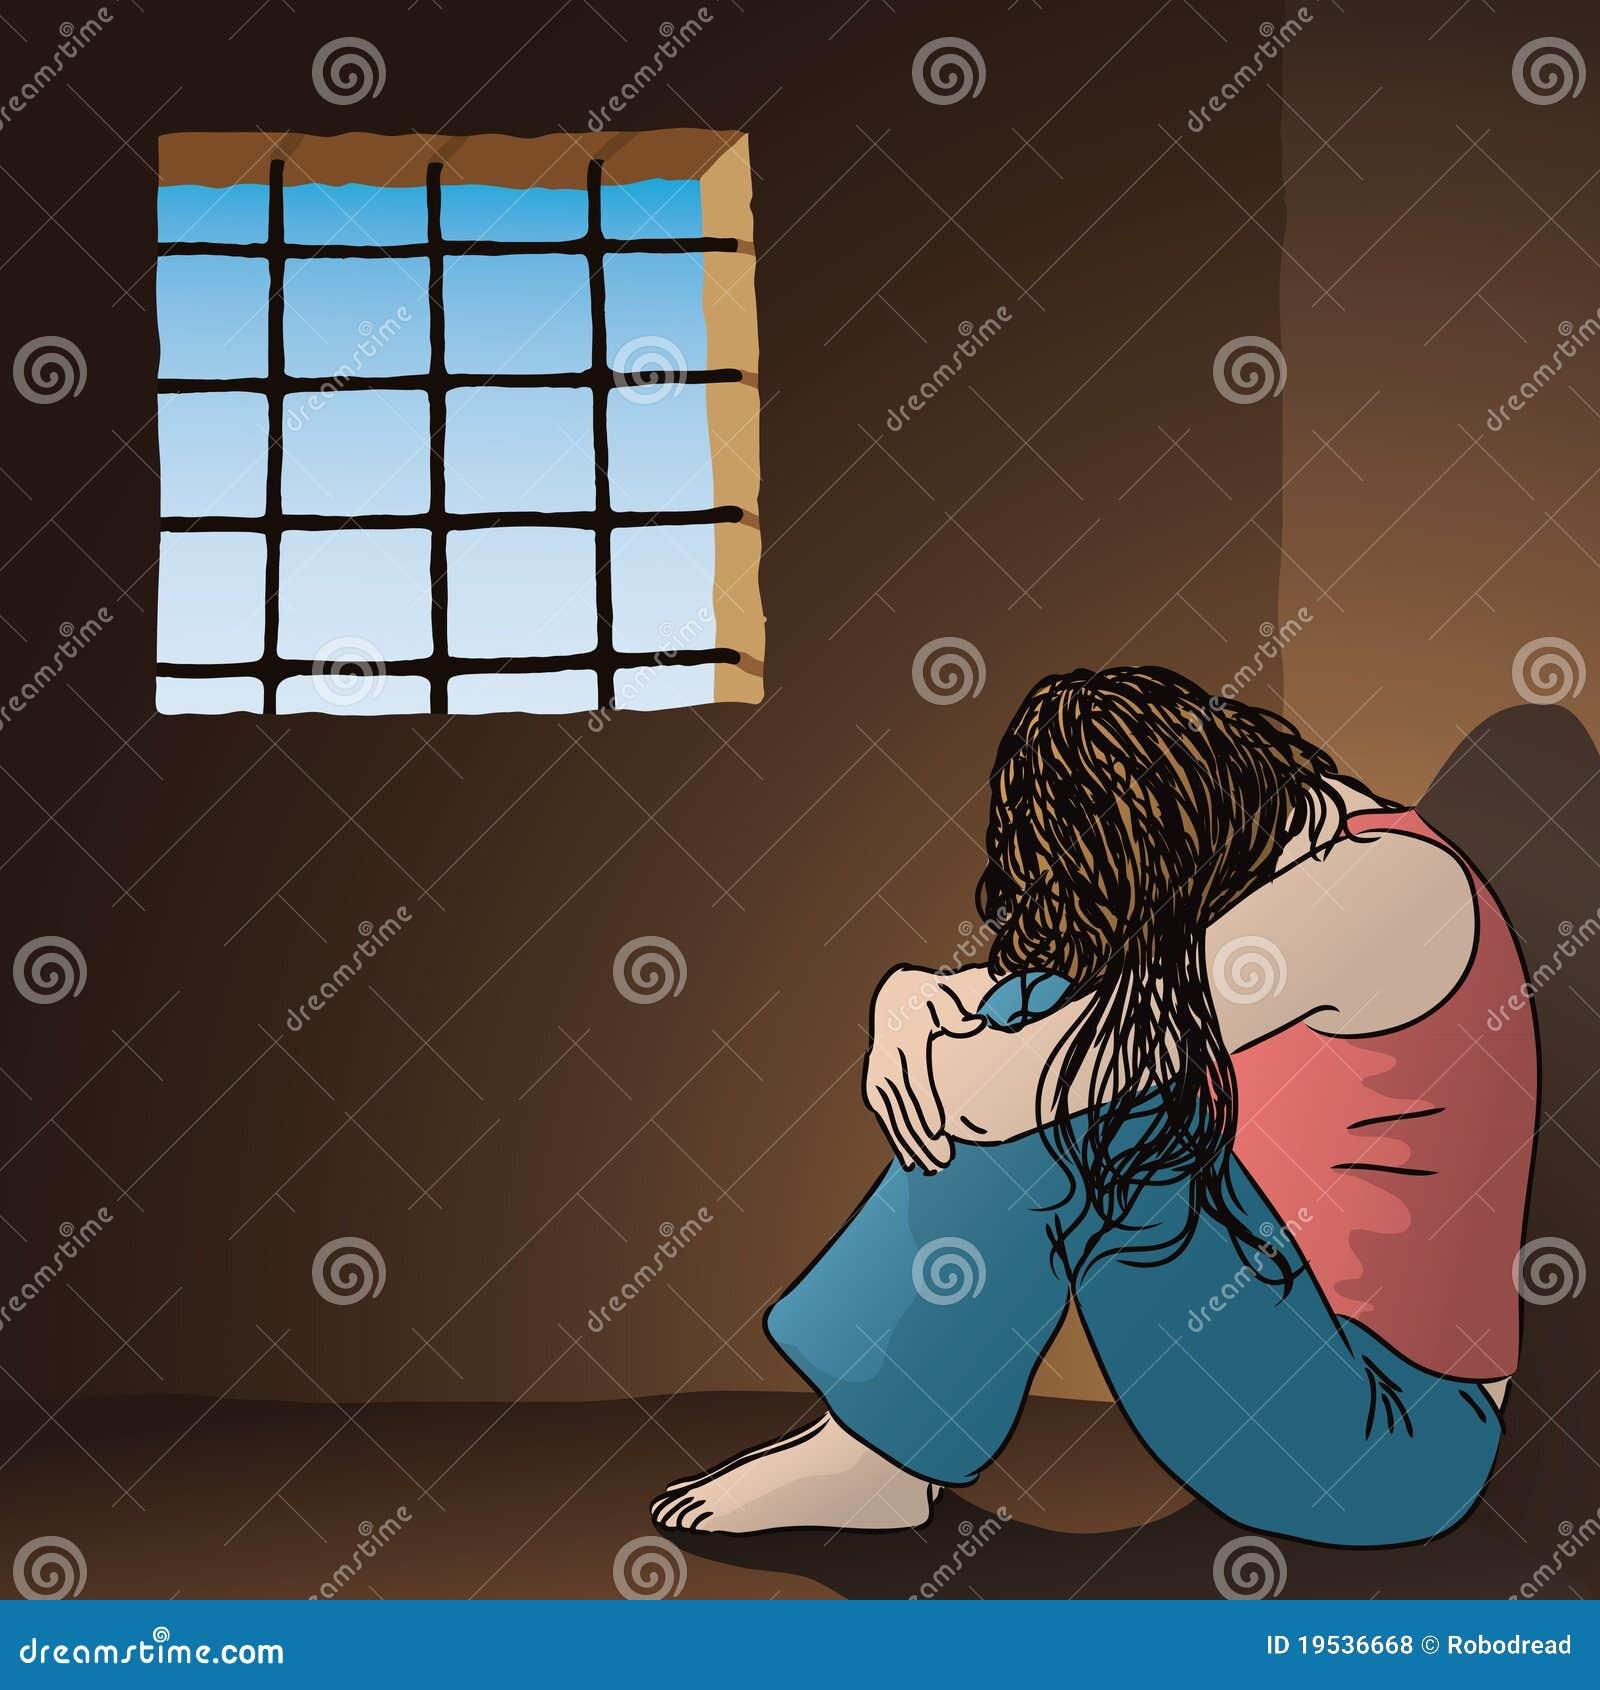 Sad woman in prison stock vector. Image of prison, dark ...